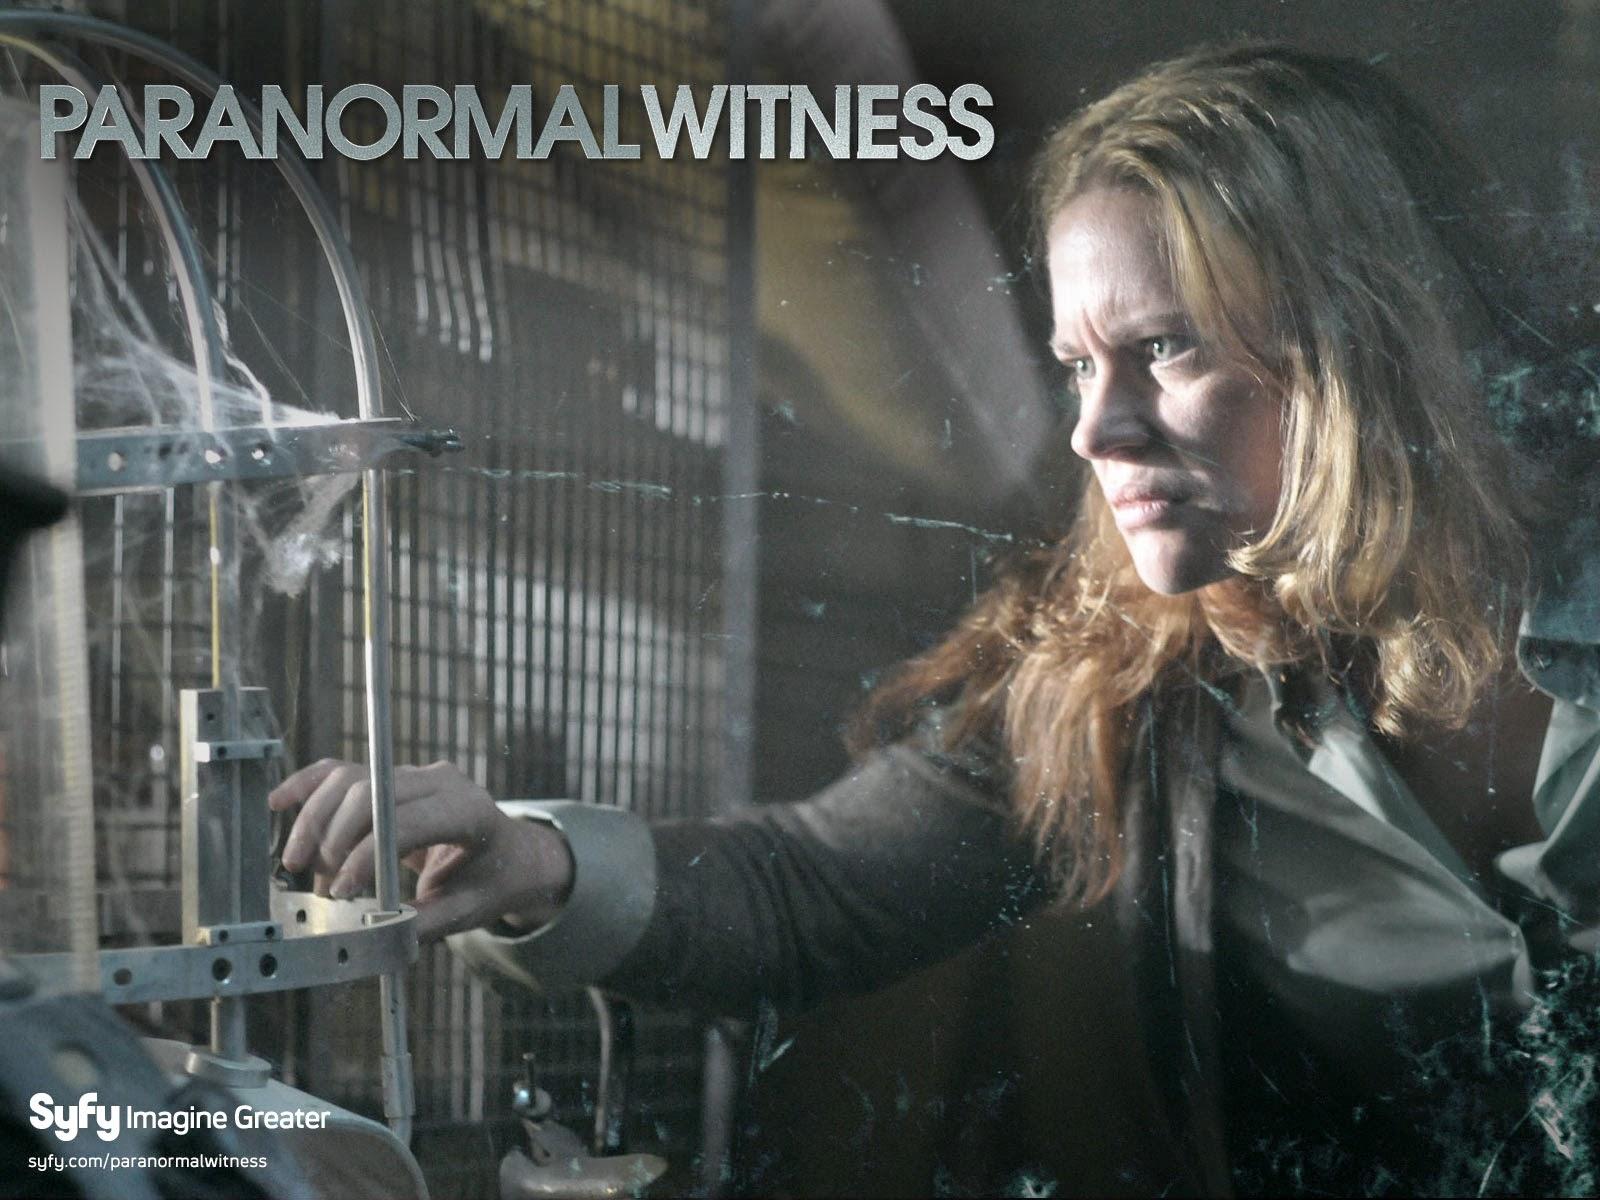 Capitulos de: Paranormal Witness